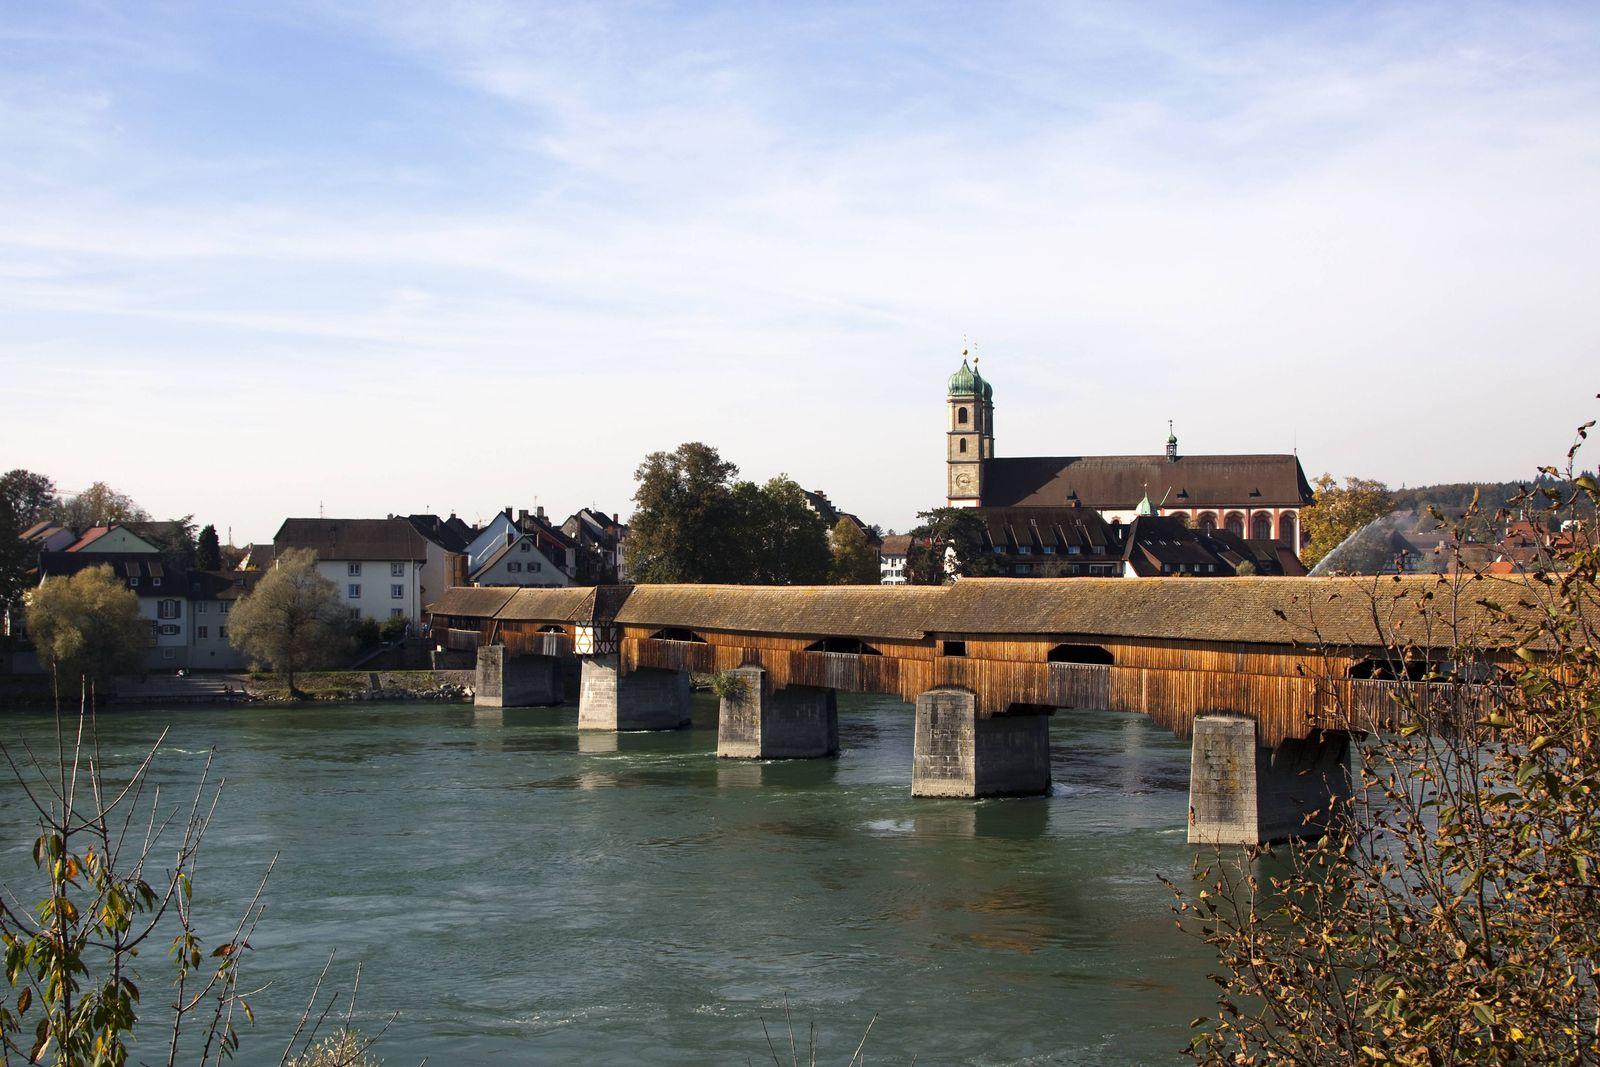 Bad Säckingen/ Holzbrücke